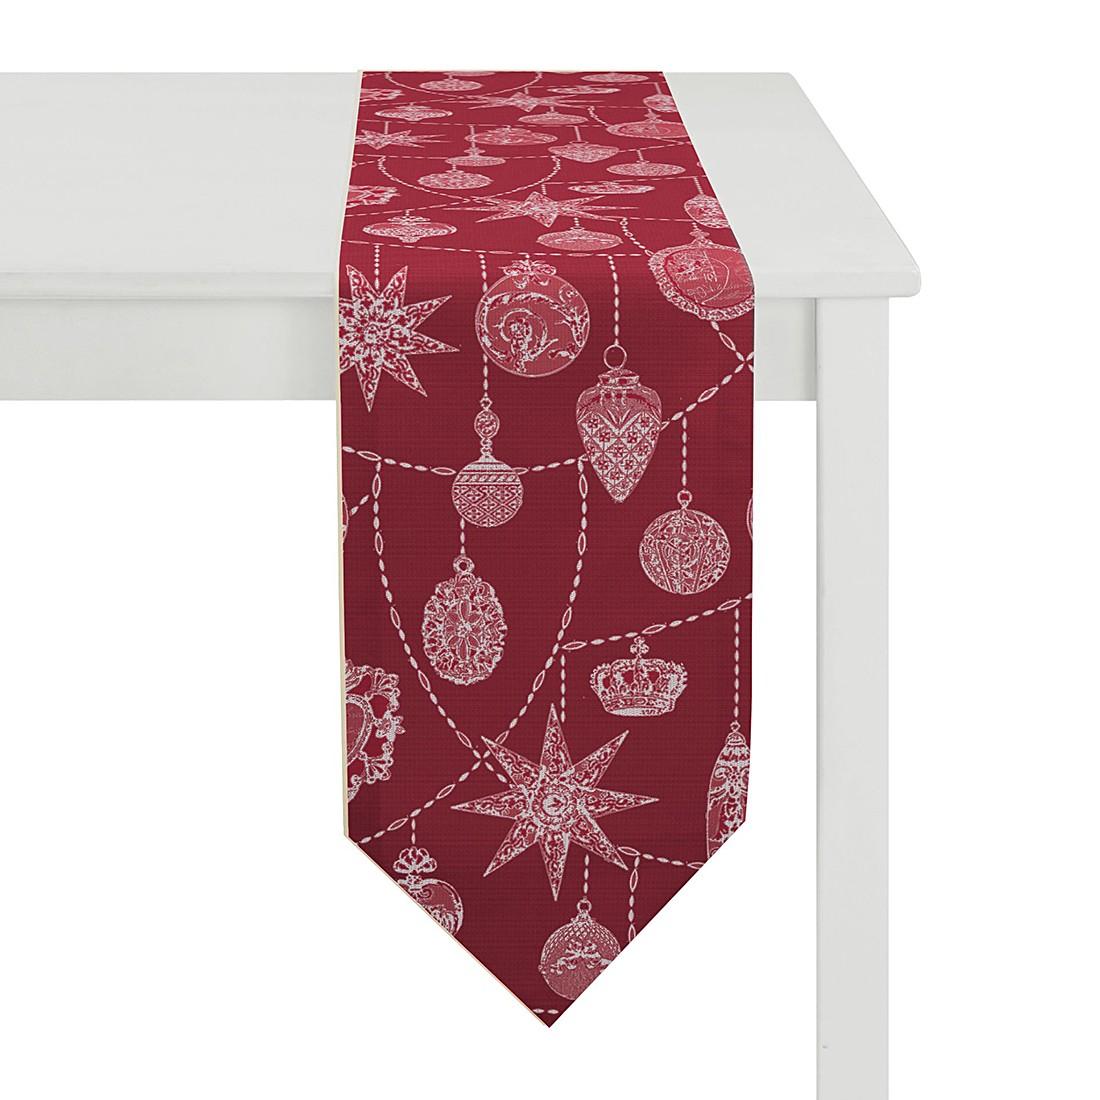 Tischband Christmas Elegance II – Rot, Apelt günstig bestellen